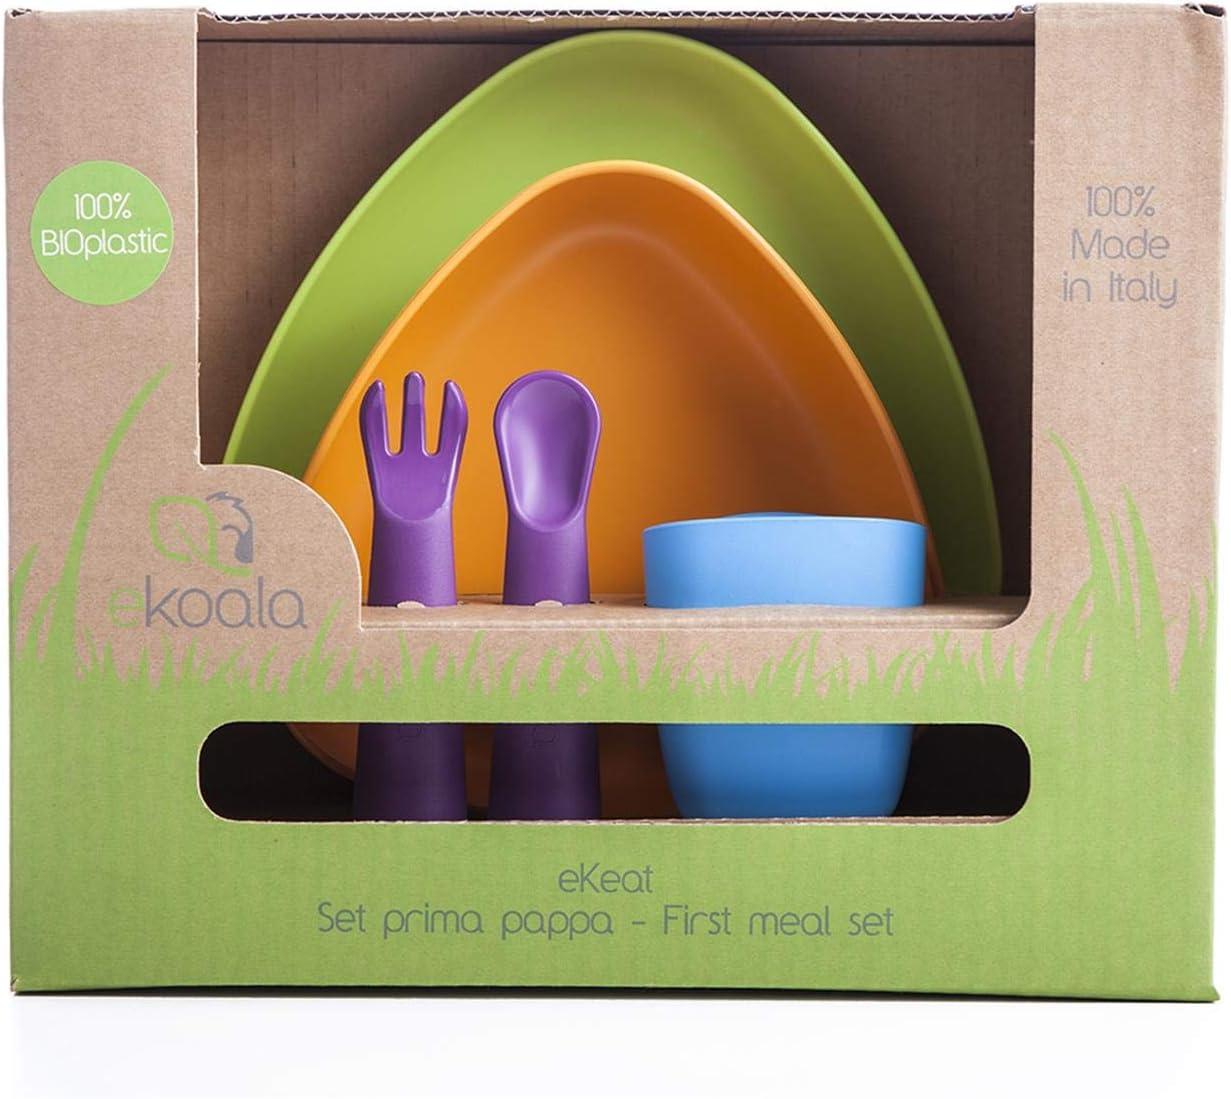 One Size eKoala eKeat First Meal Set Multicolour